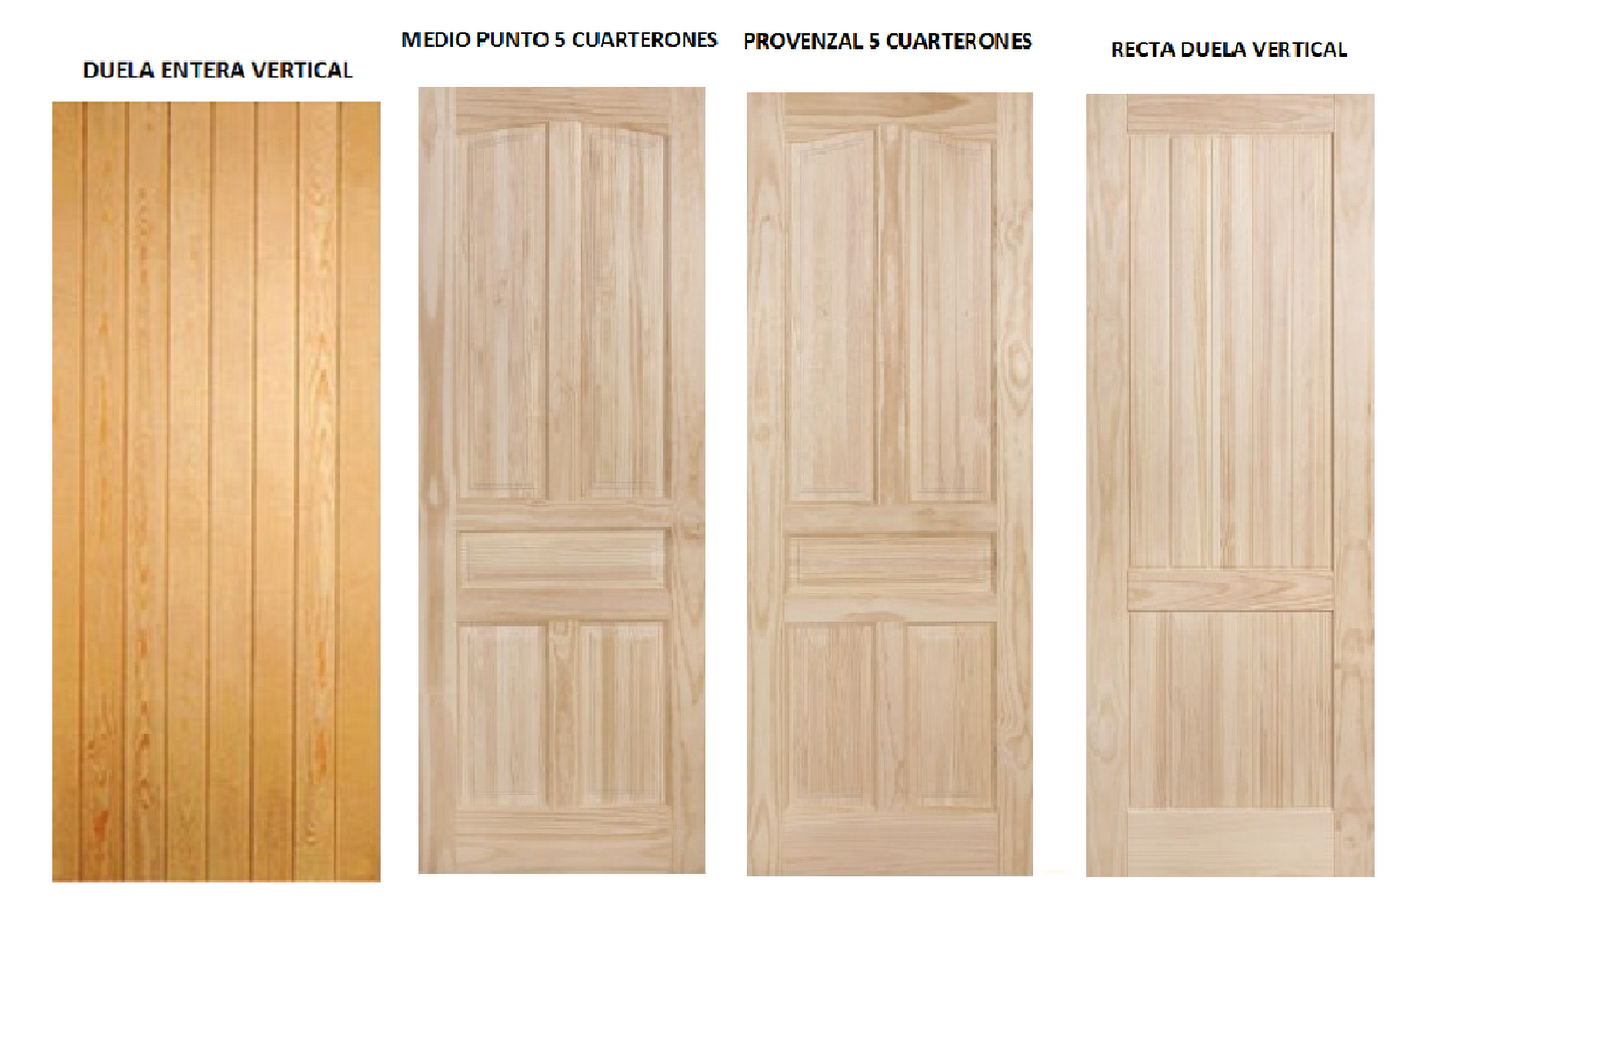 Carpinter a de madera mart n torralbo puertas for Carpinteria en madera